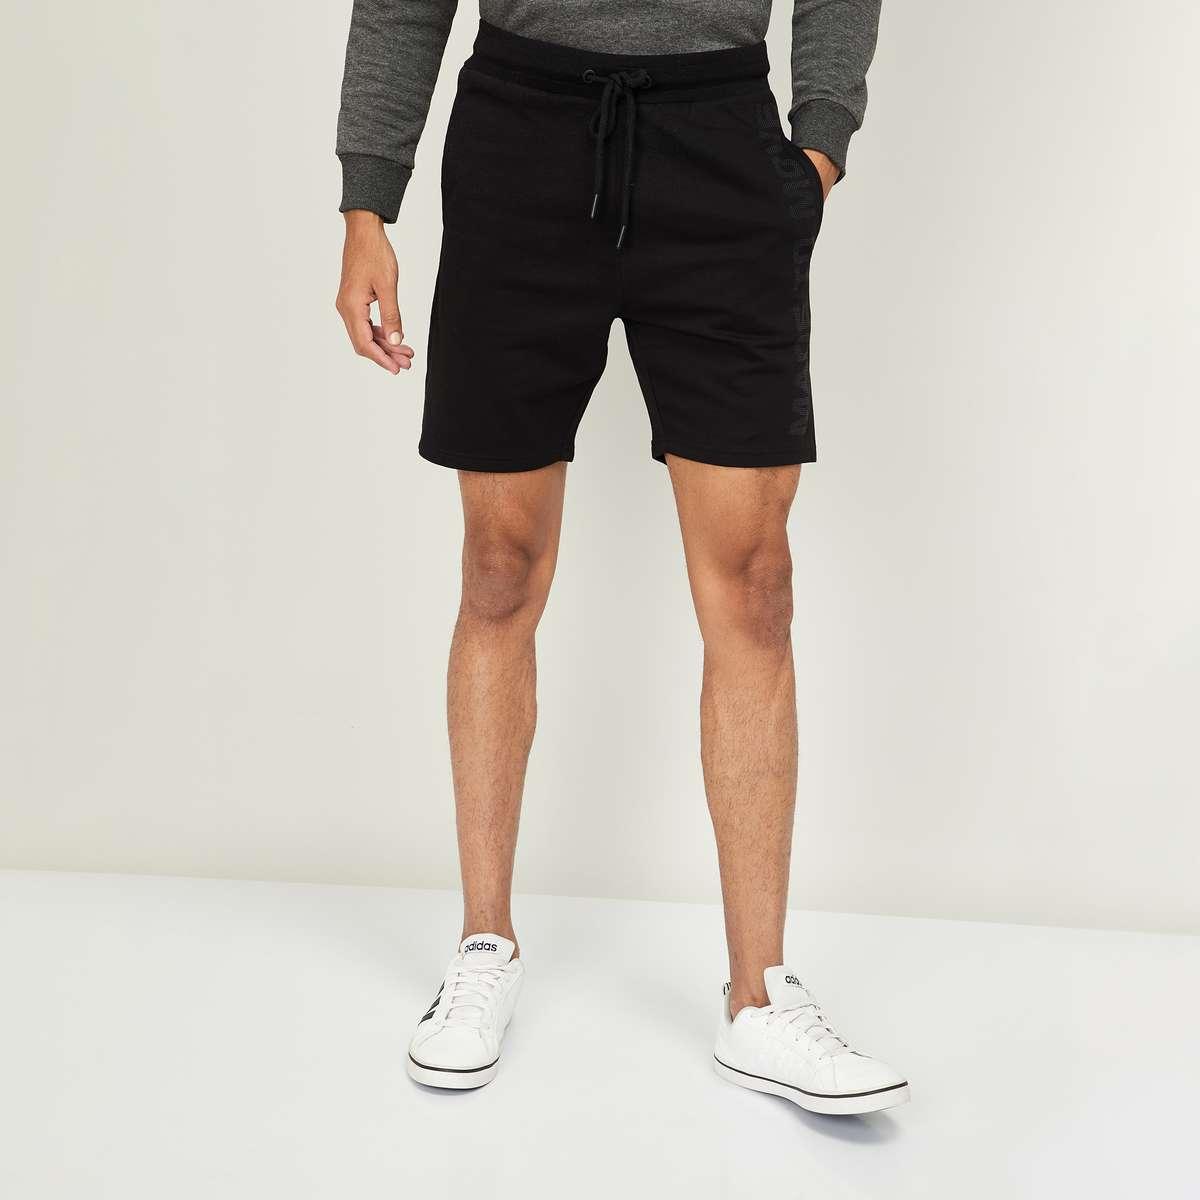 3.KAPPA Men Solid Elasticated Shorts